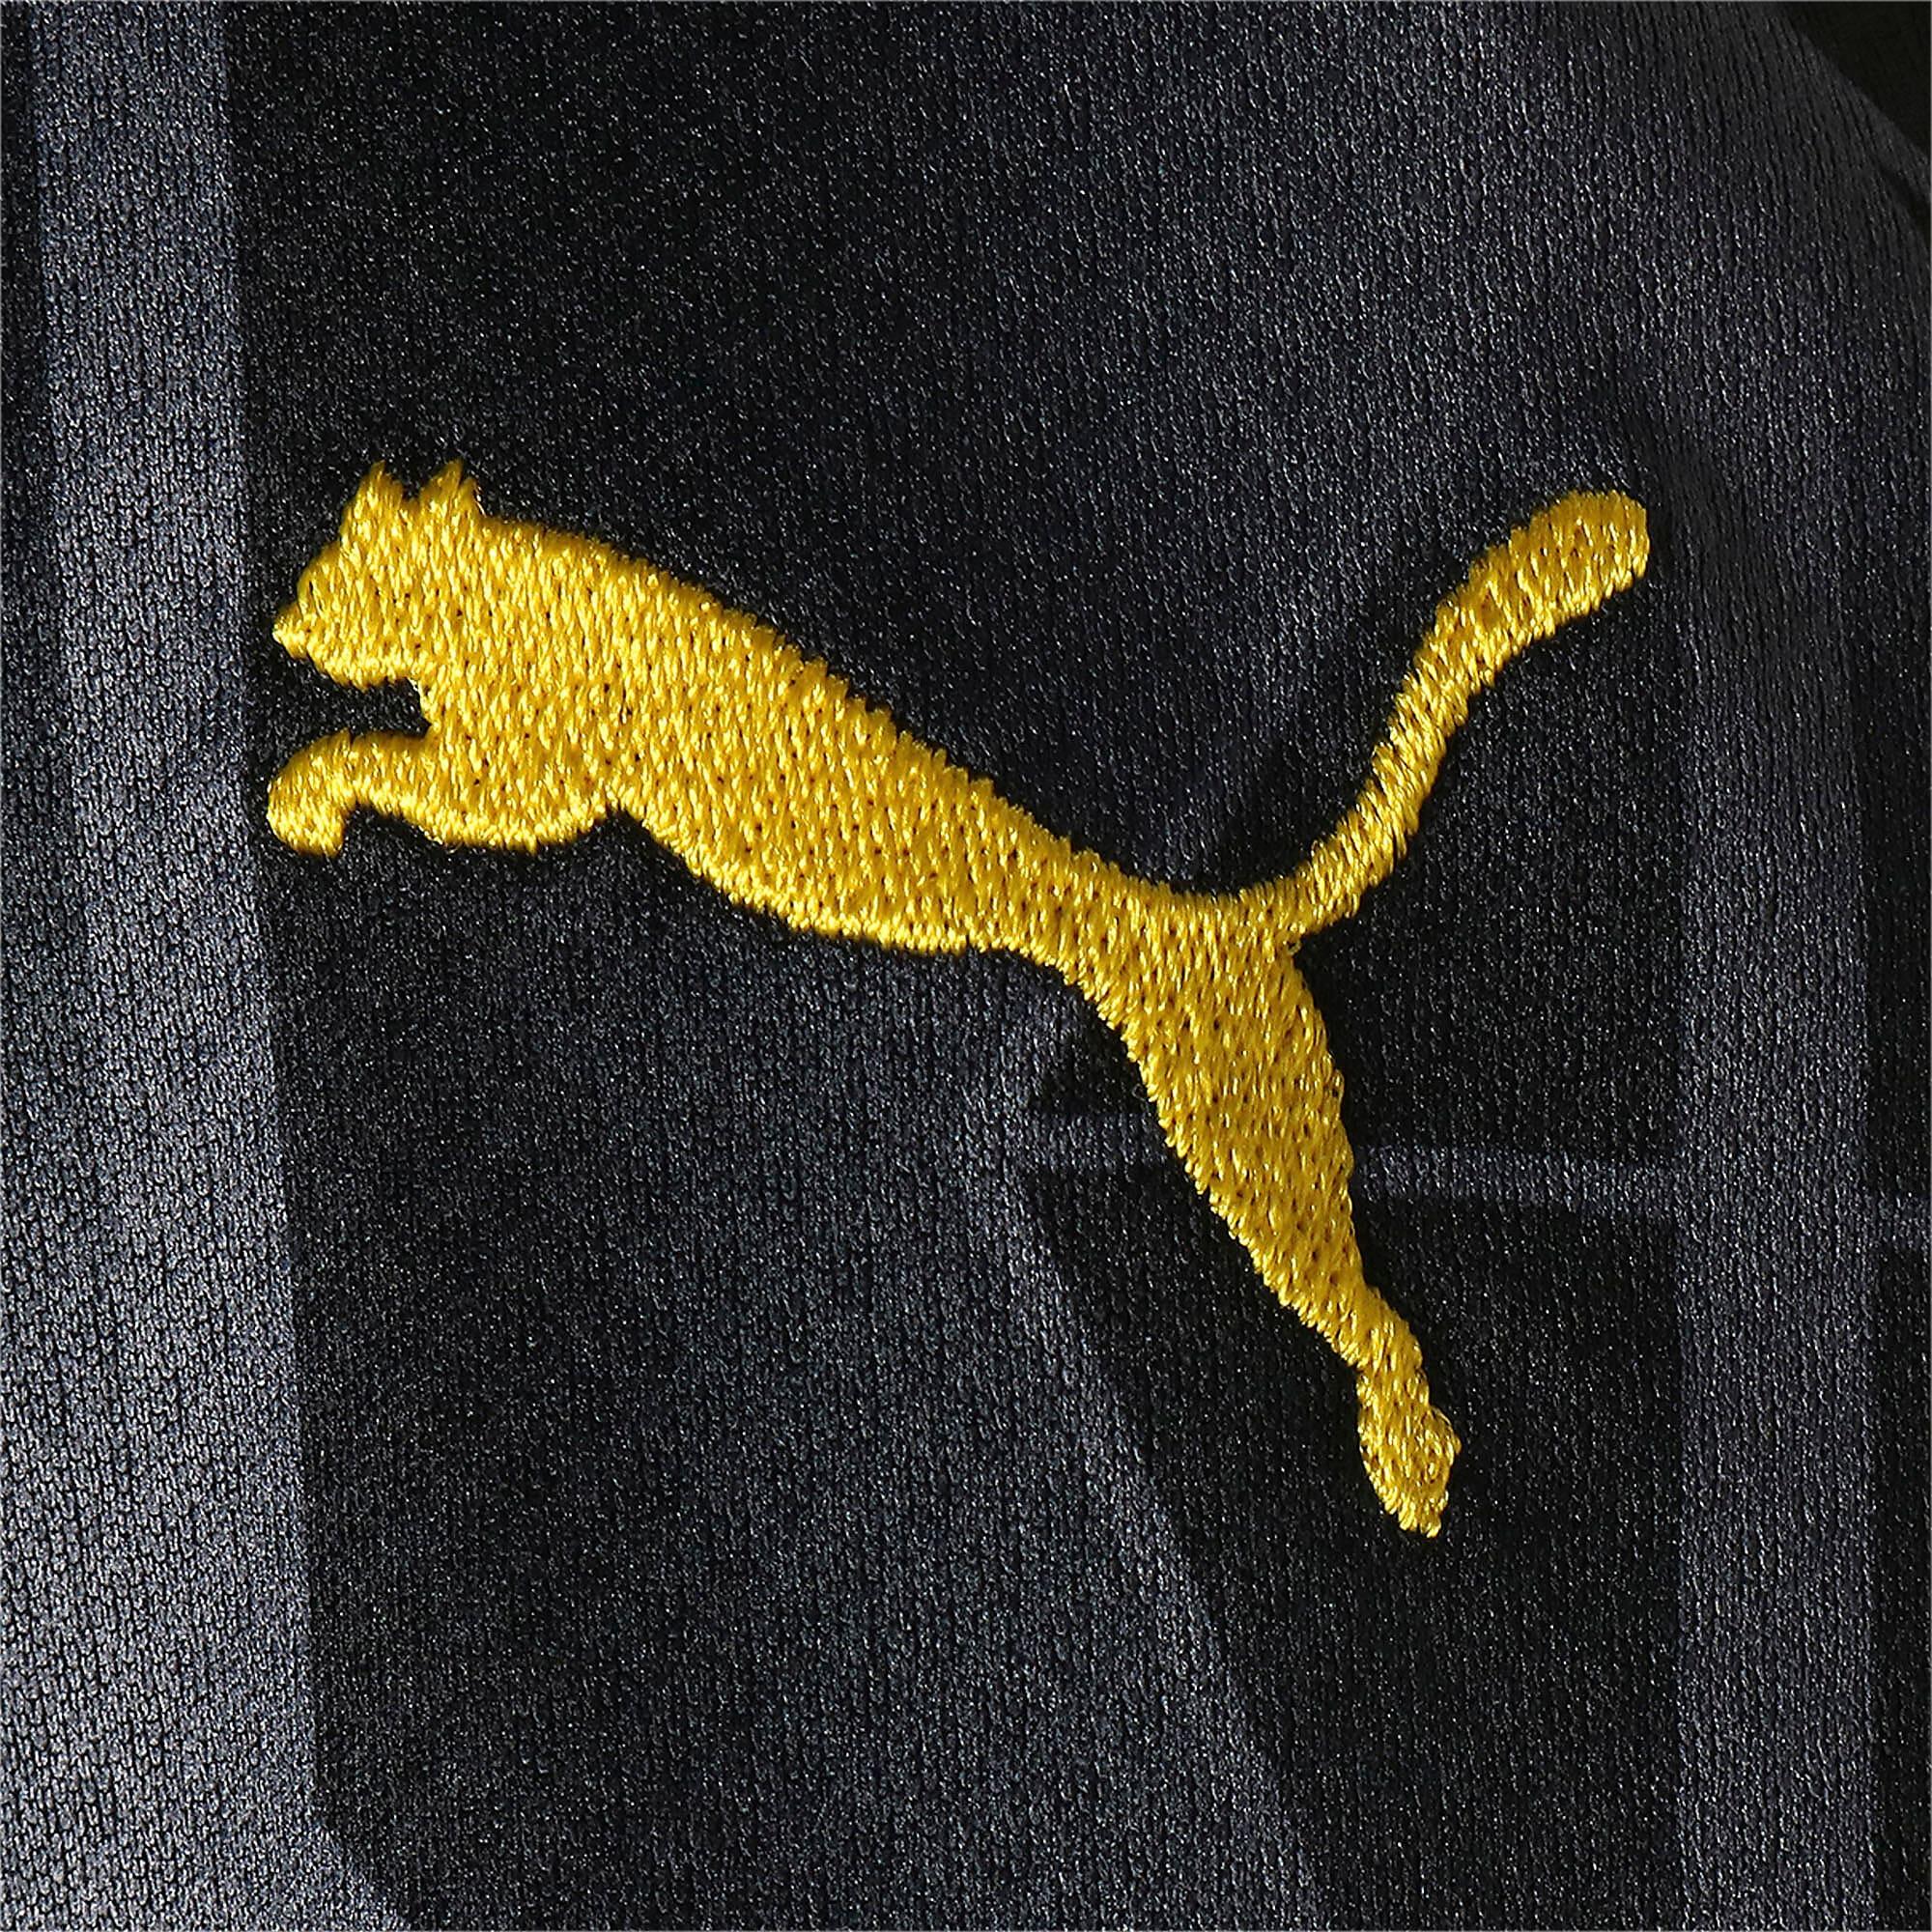 Thumbnail 9 of ドルトムント BVB SS カップ レプリカシャツ (半袖), Cyber Yellow-Puma Black, medium-JPN